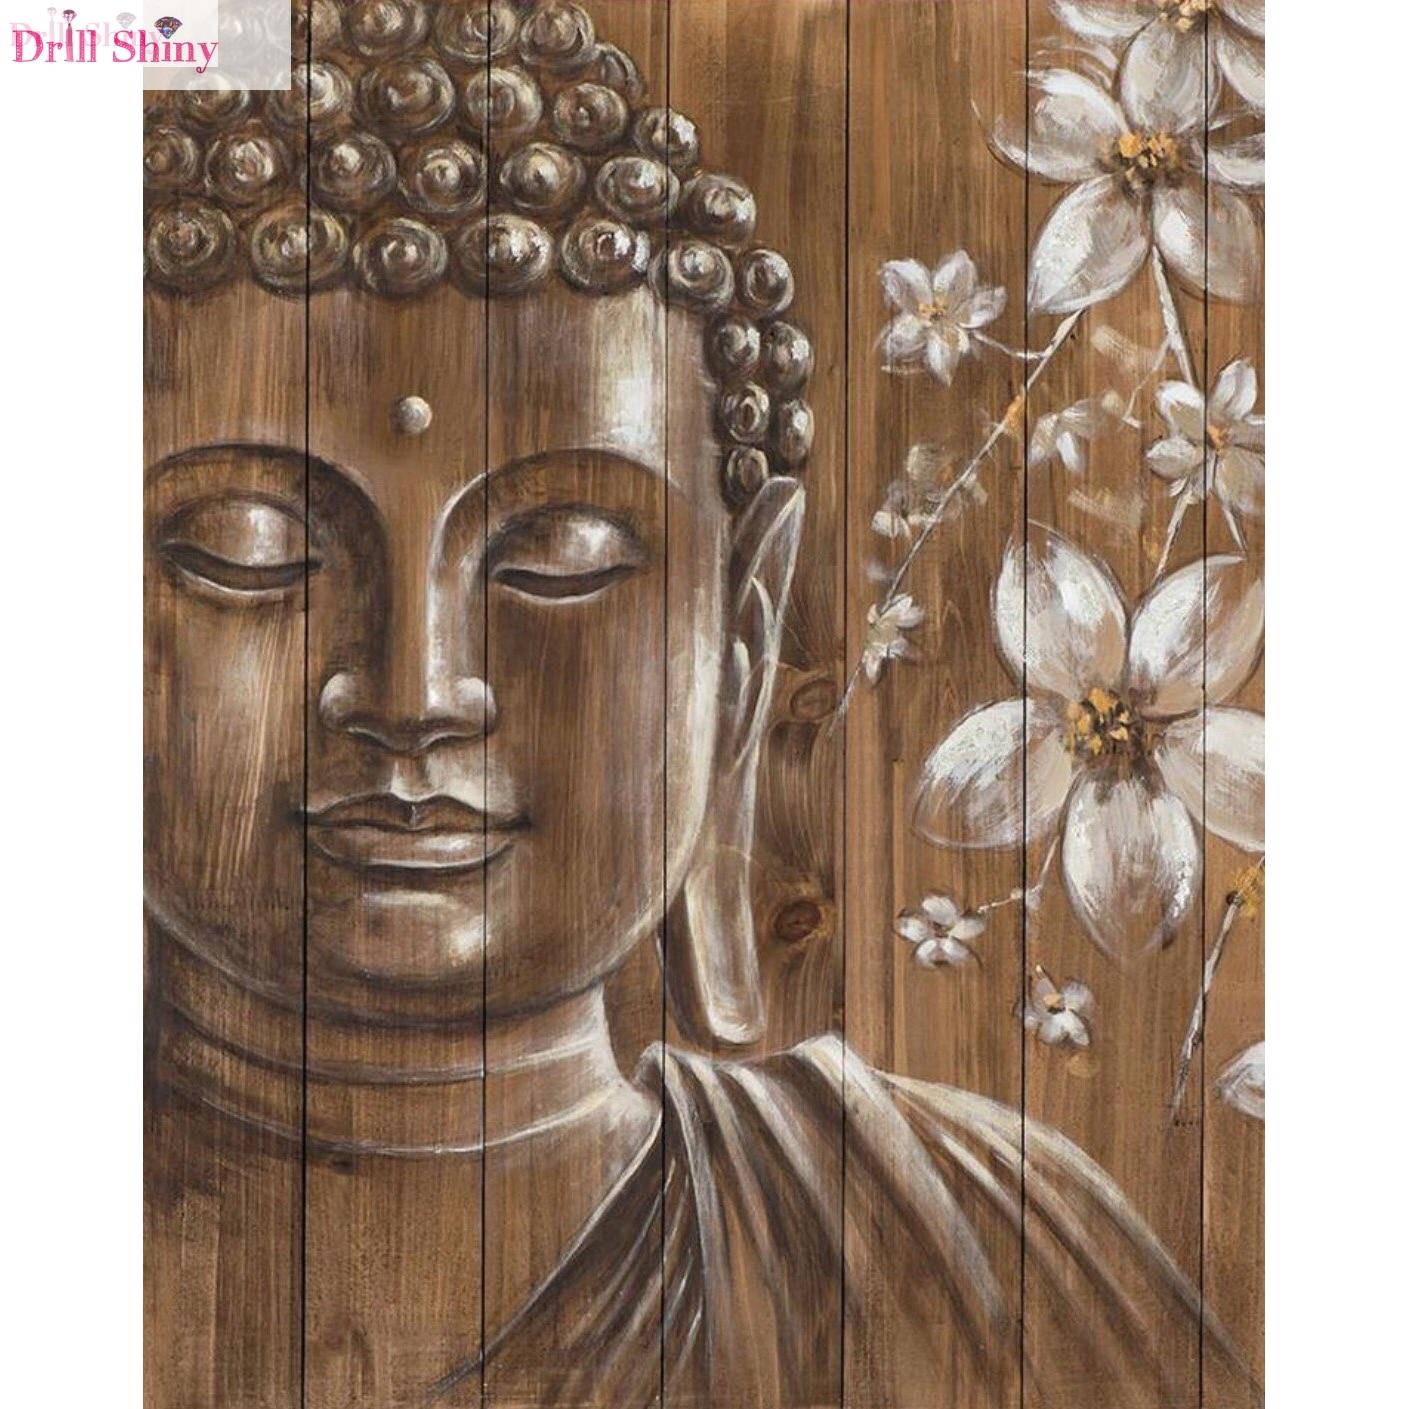 Original Vinyl Fatima Mural Roomdecor Buddha Wall Sticker Decals Flower Eye Hamsa Handx1 Home & Garden